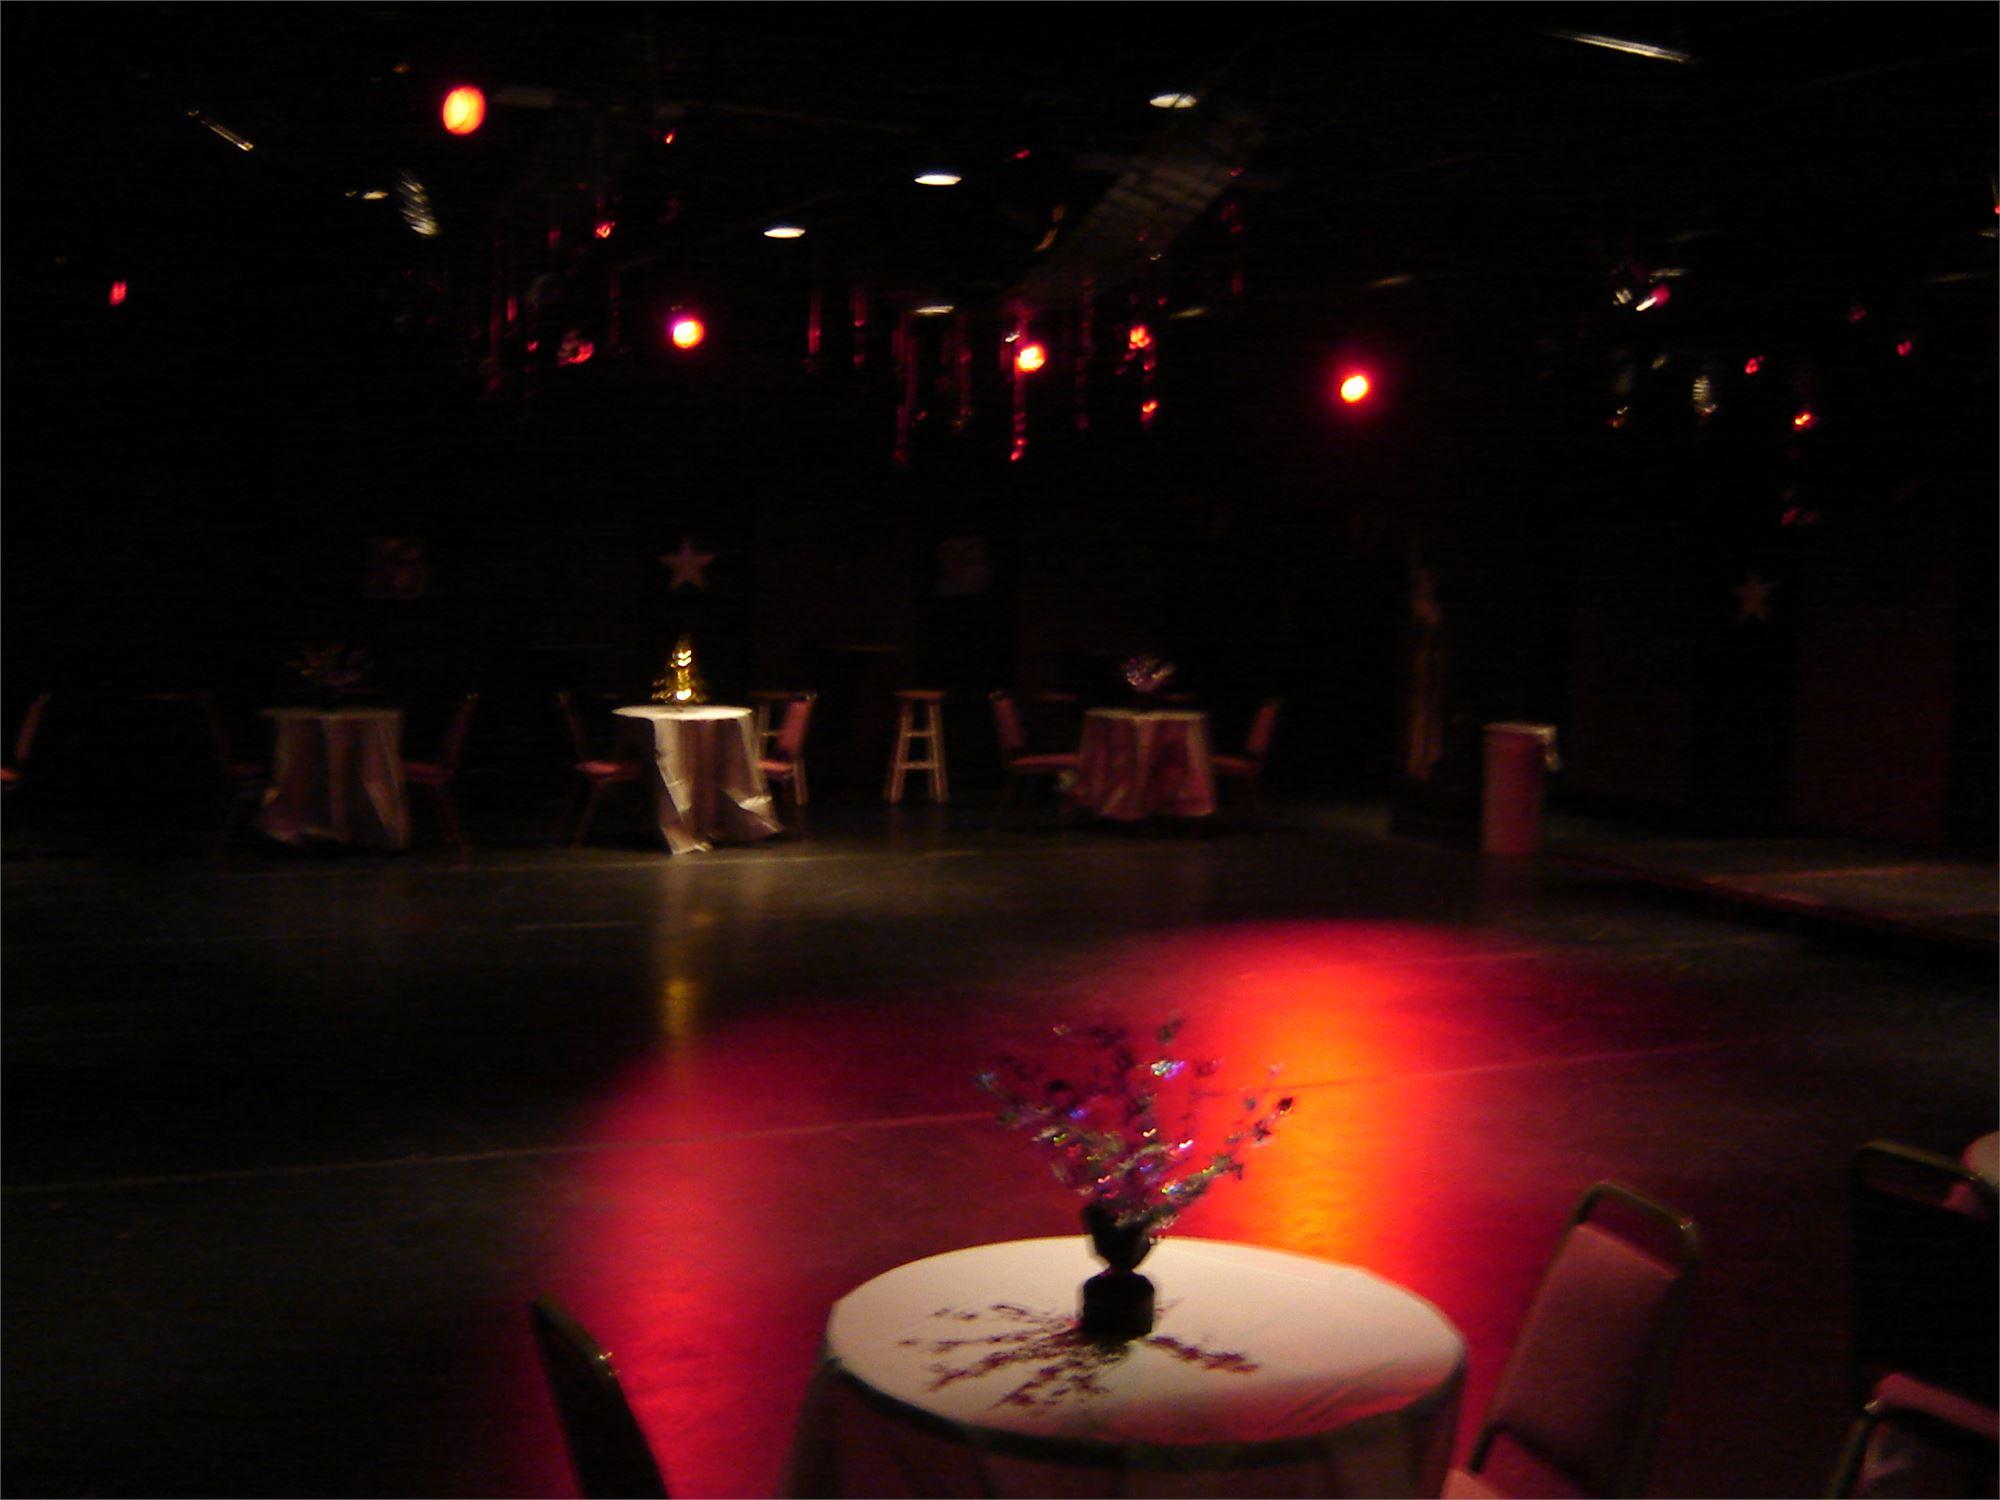 Hussey Playhouse